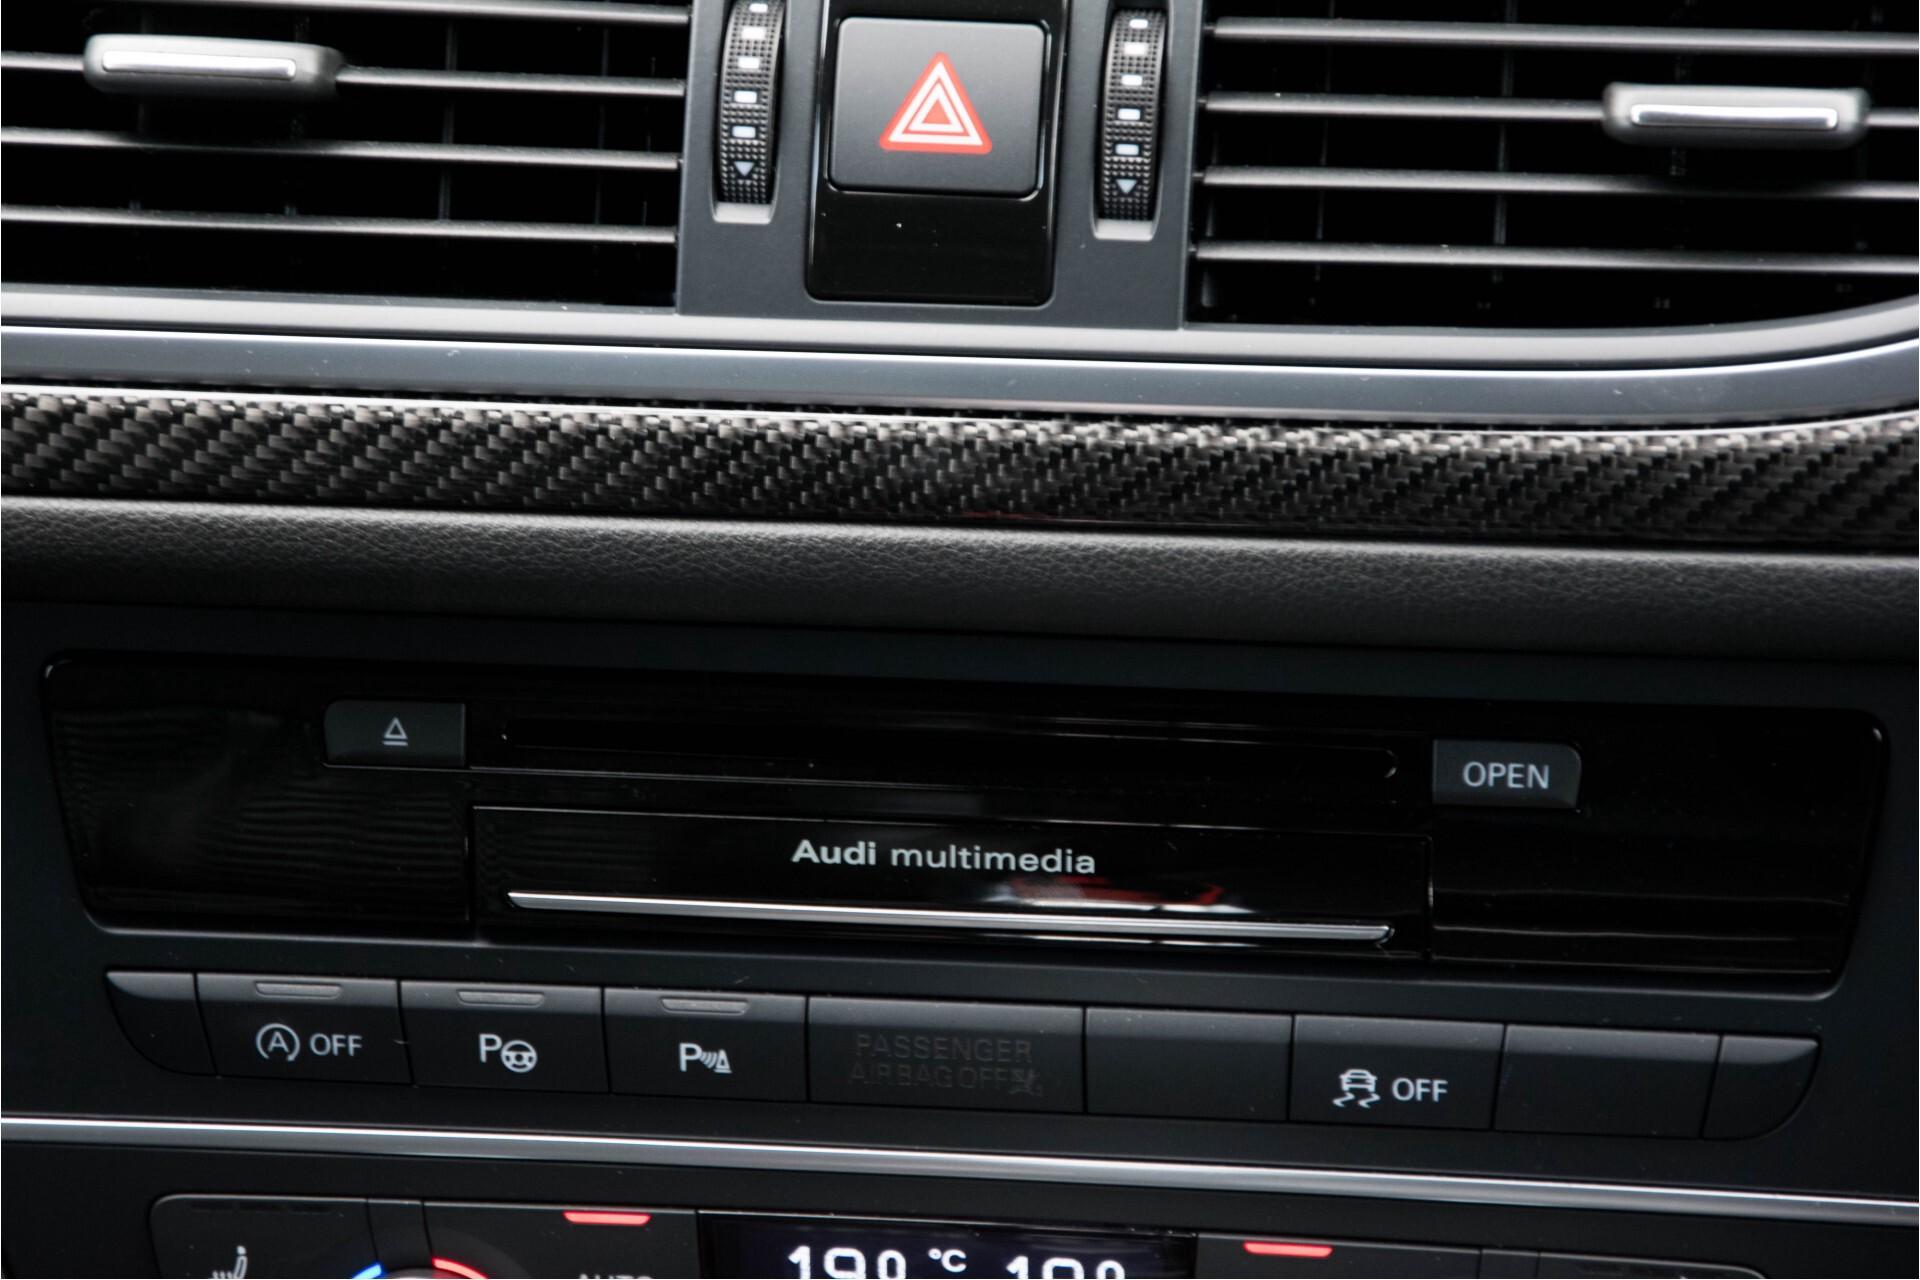 Audi RS6 Avant 4.0 TFSI Quattro B&O/Carbon/Head-Up/Nachtzicht/Exclusive/Camera/Keyless/Pano Aut8 Foto 15